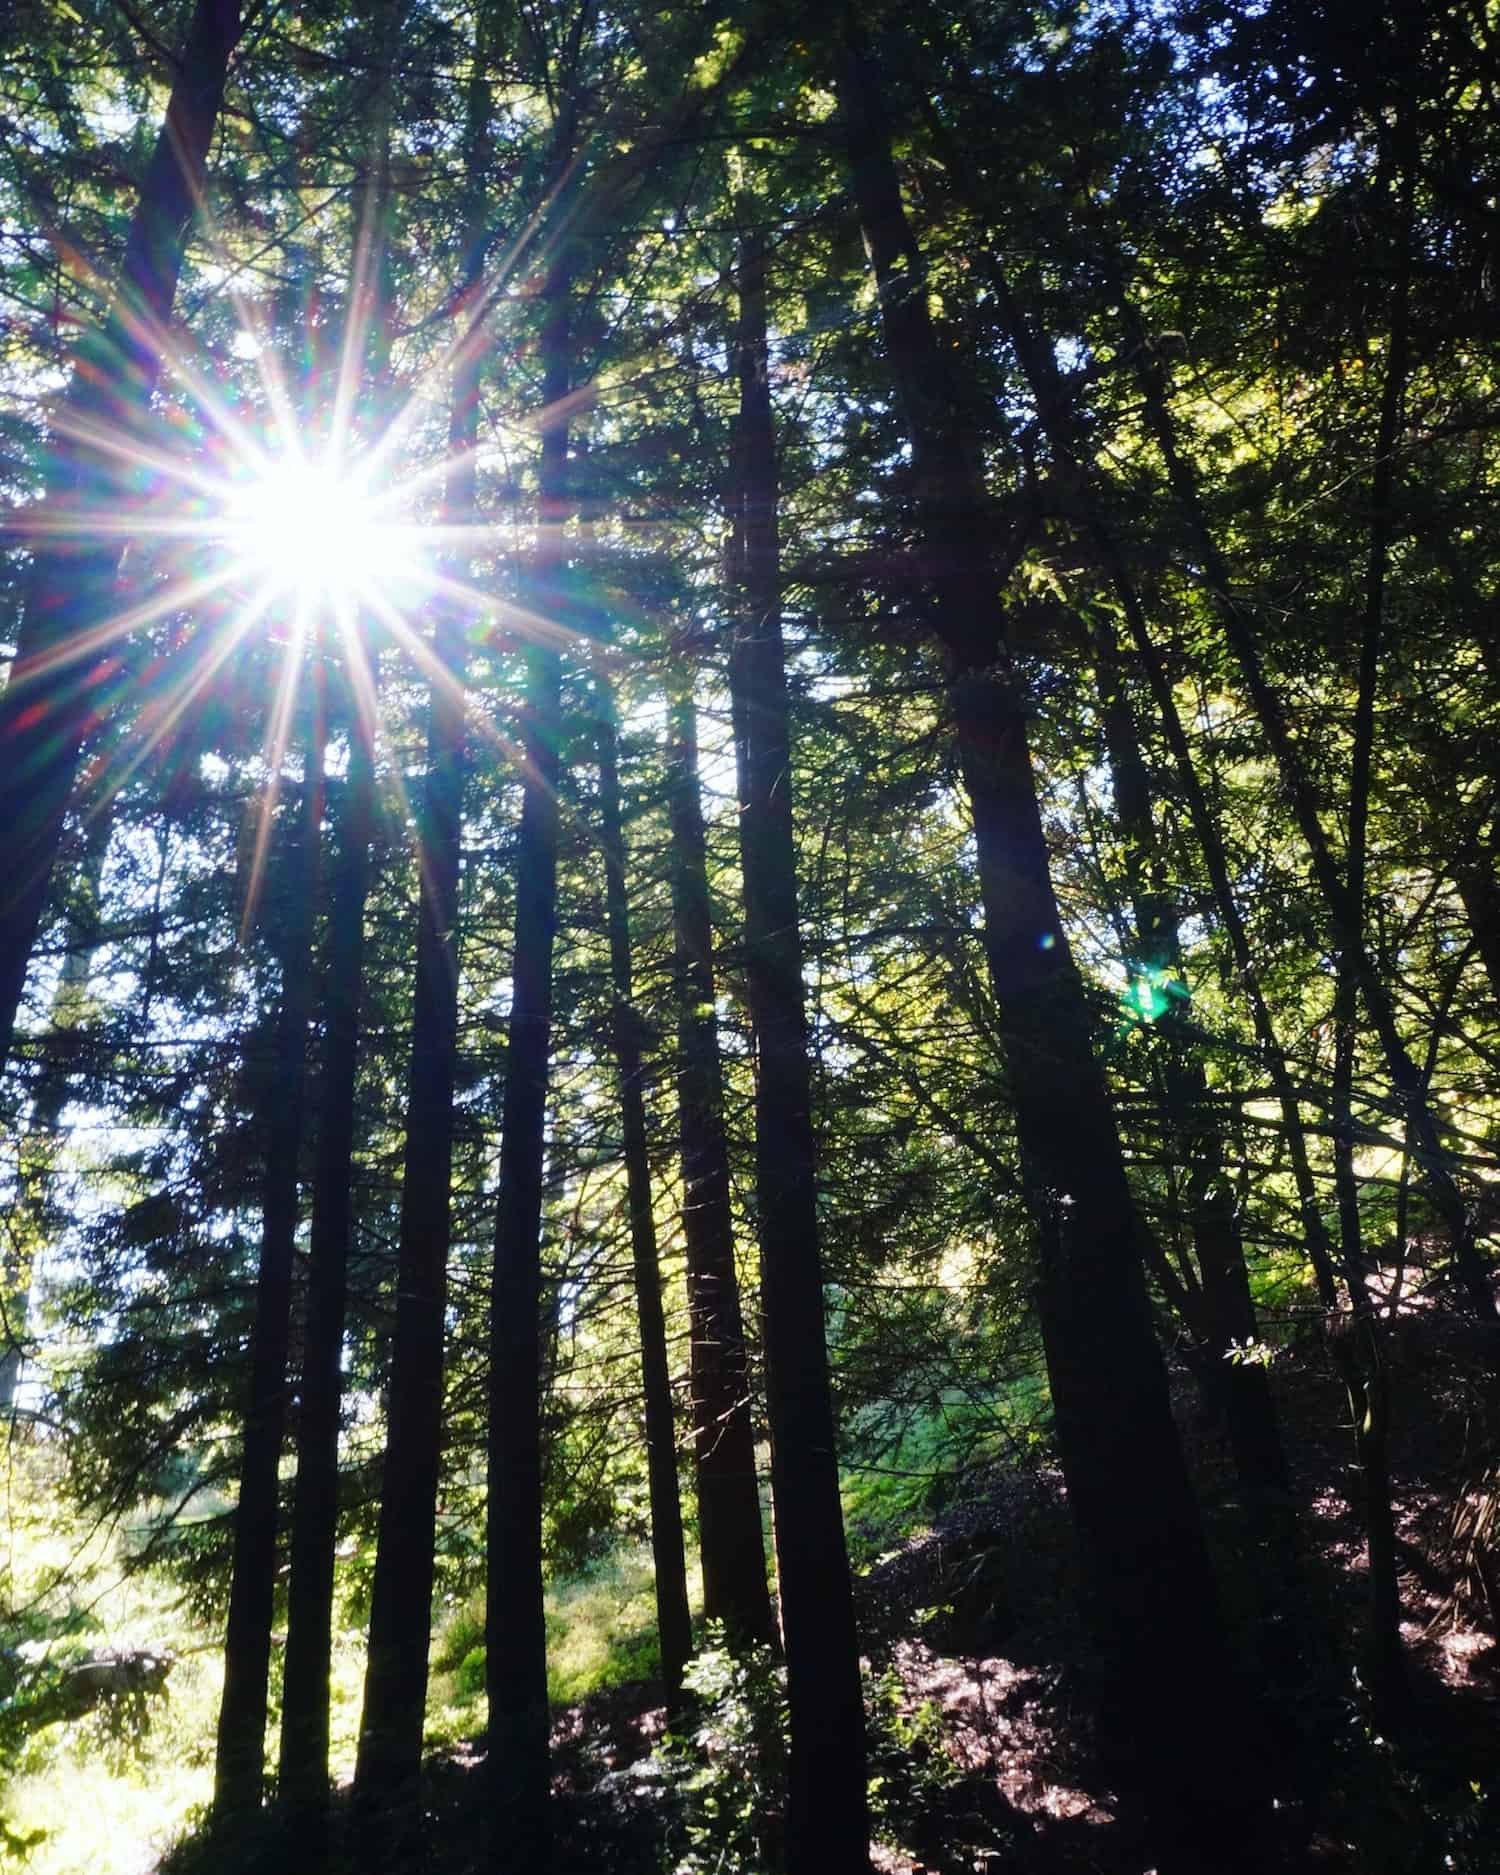 Redwoods near San Francisco - Redwoods Regional